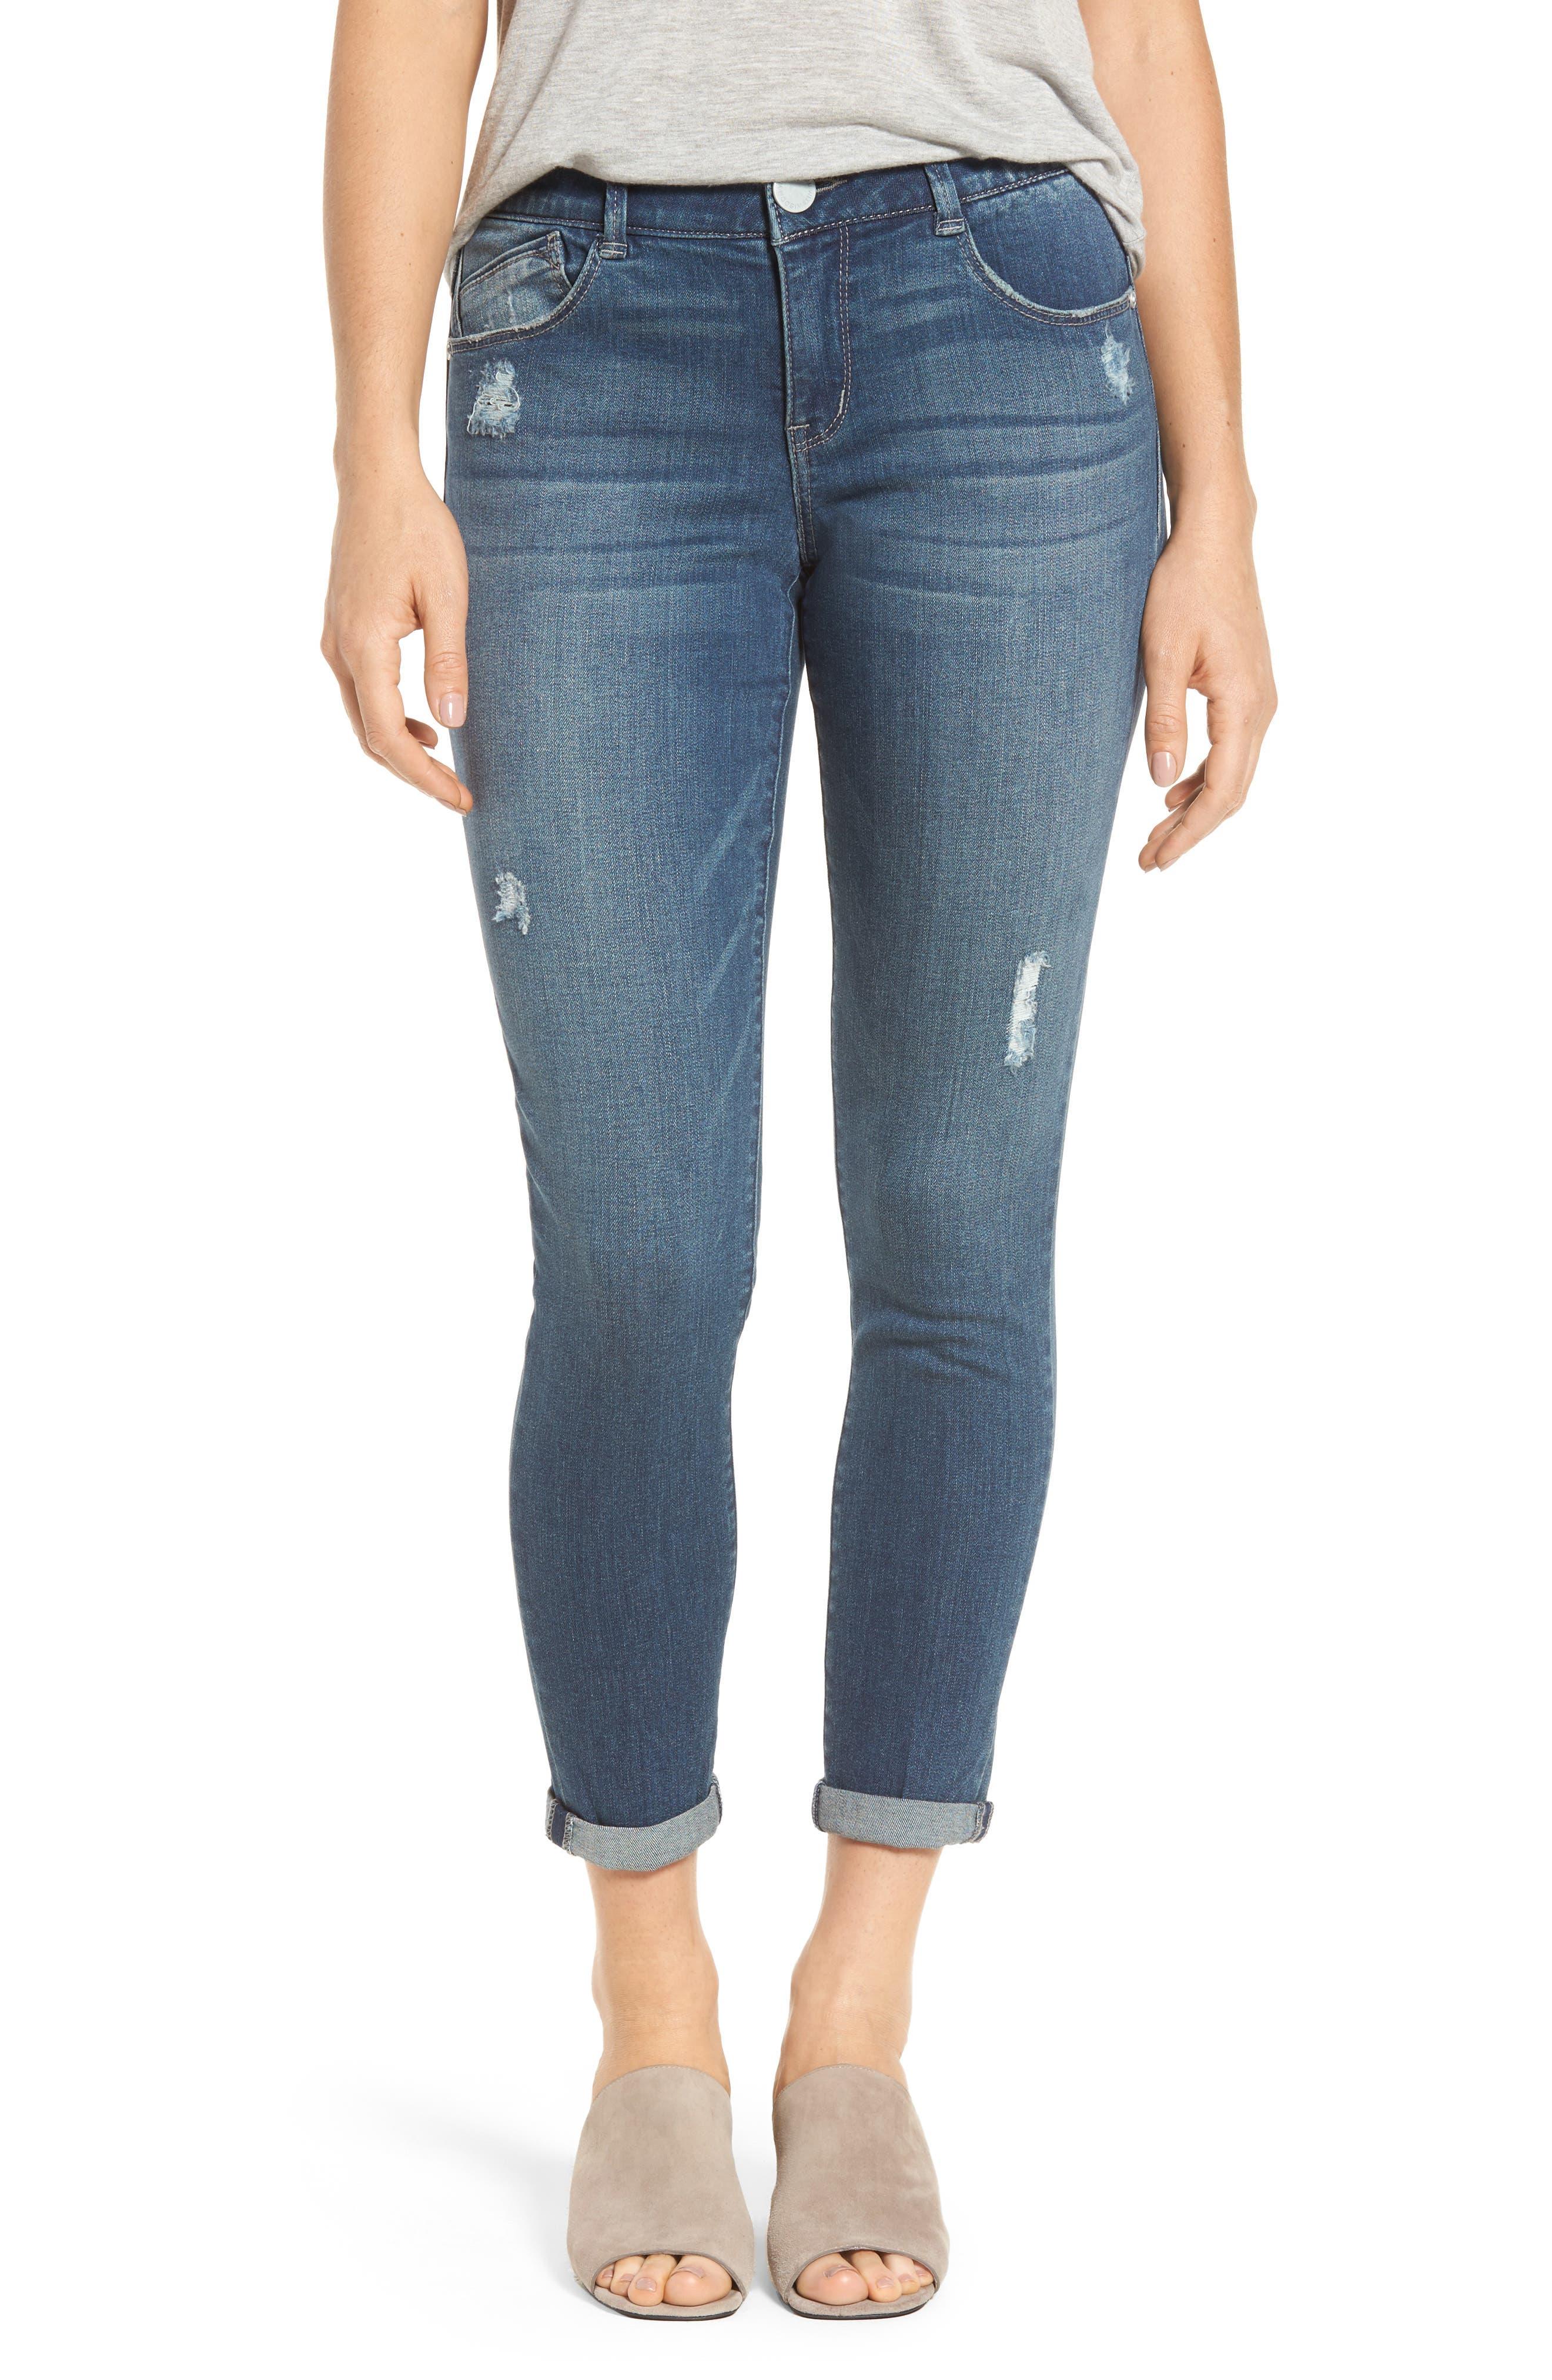 Wit & Wisdom Ab-solution Boyfriend Ankle Jeans (Nordstrom Exclusive) (Regular & Petite)